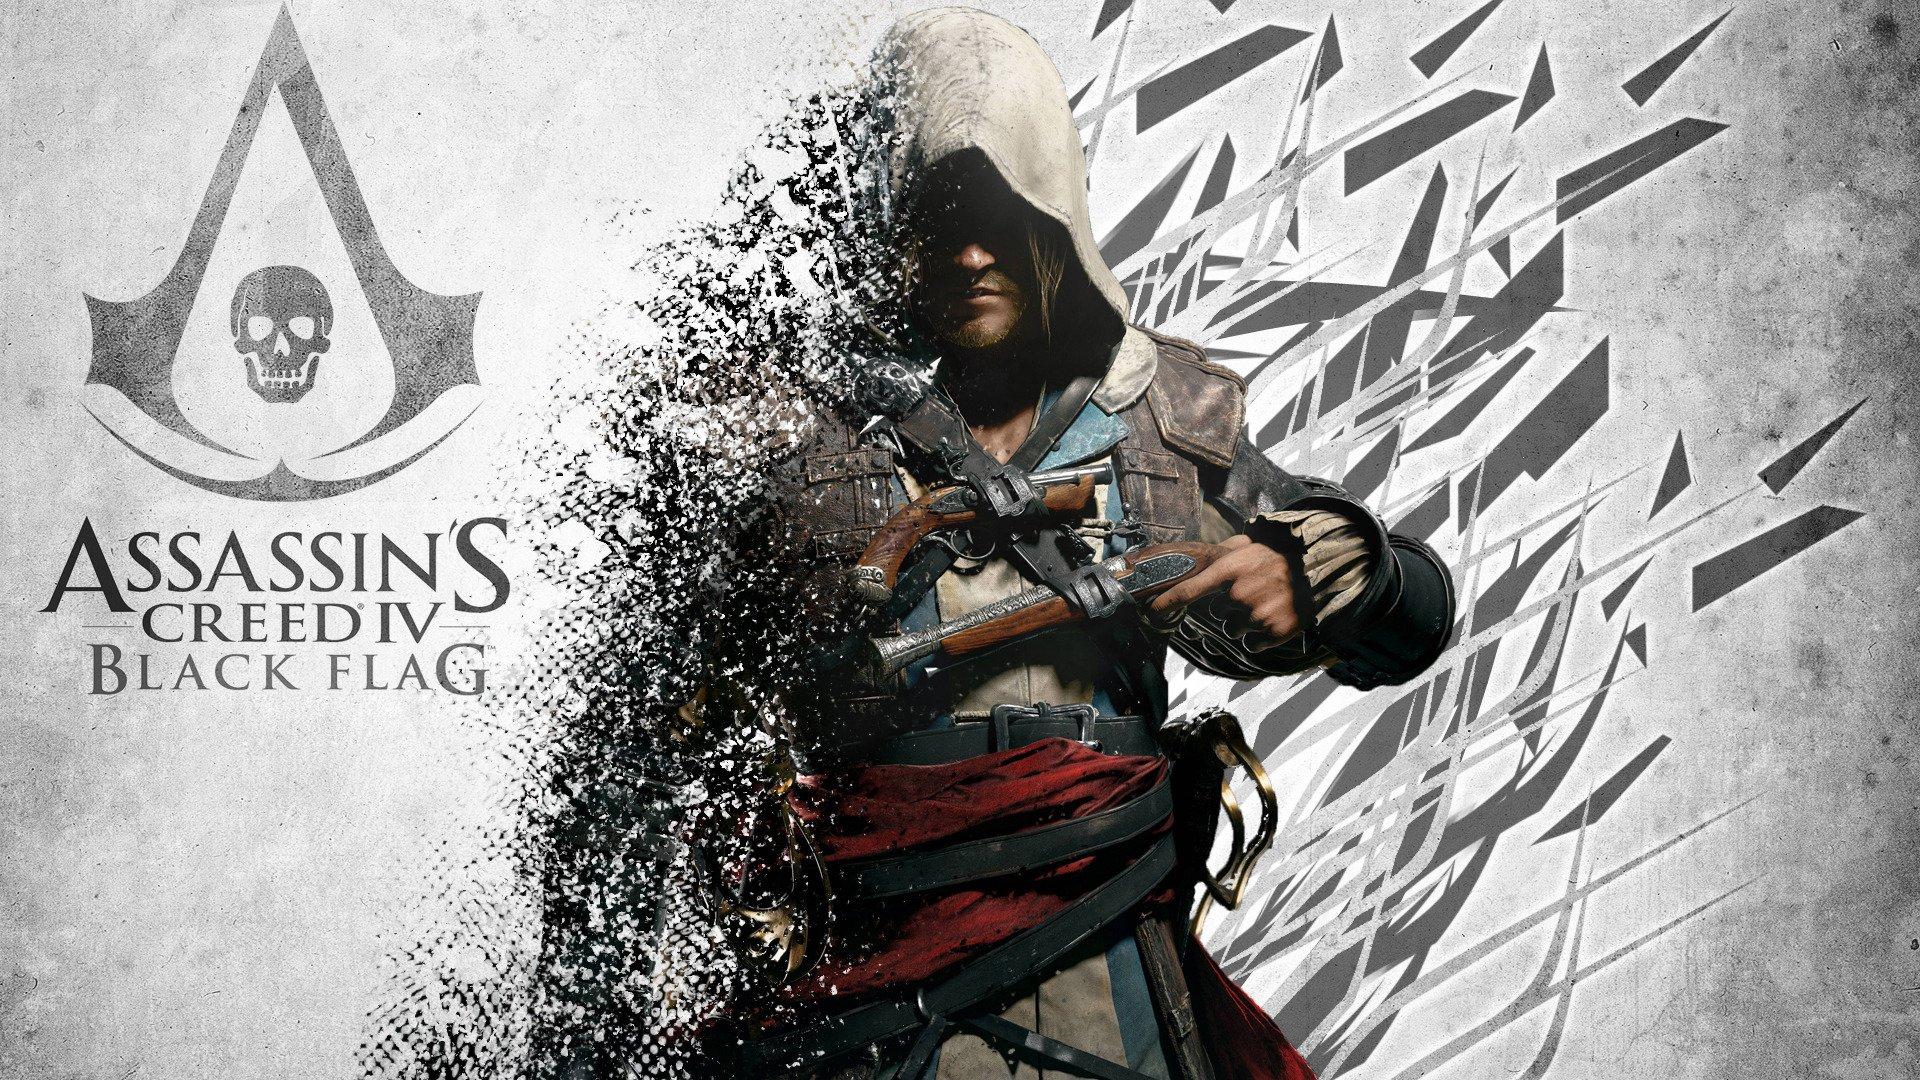 Assassin 39 s creed black flag wallpapers wallpapersafari for Assassin s creed sfondi